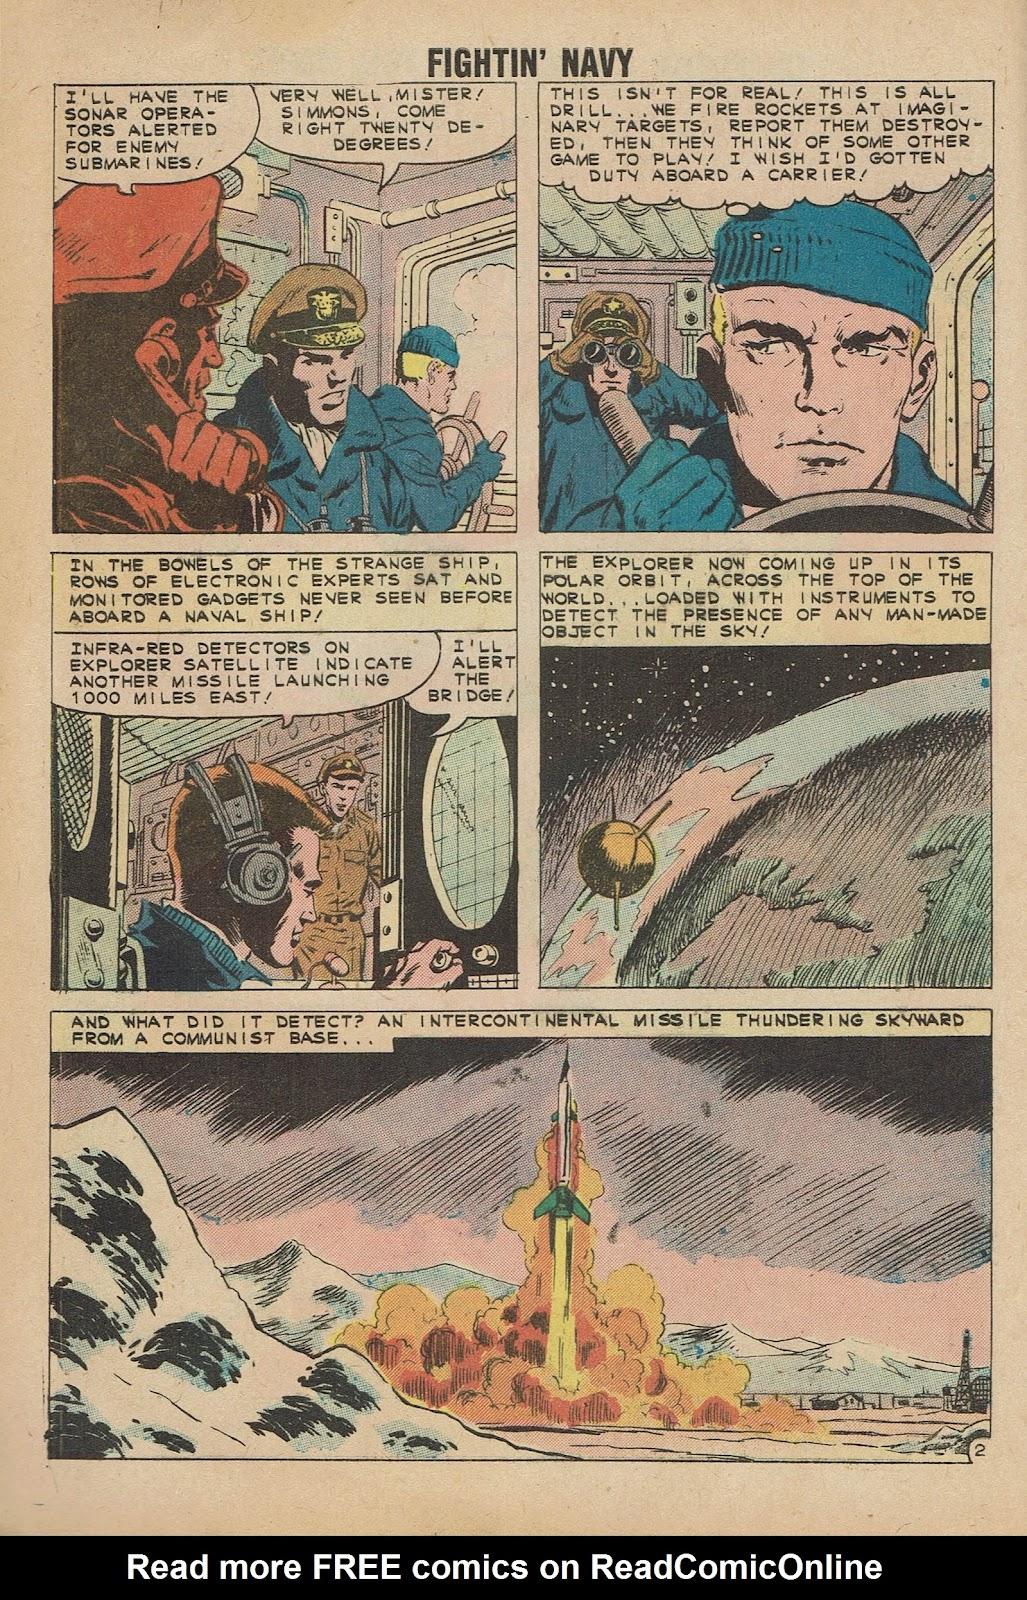 Read online Fightin' Navy comic -  Issue #98 - 4